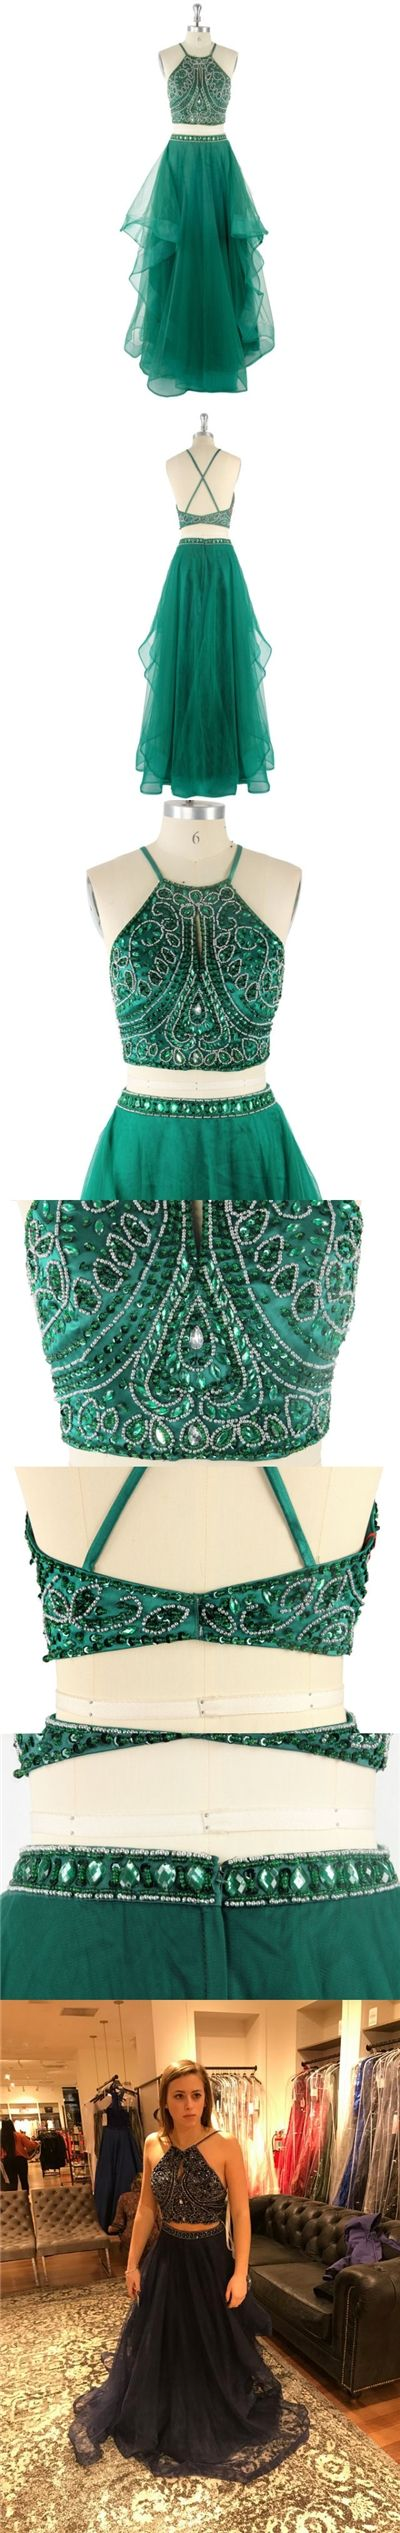 Two Piece Prom Dresses A-line Halter Floor-length Hunter Green Prom Dress/Evening Dress JKL279#Halter #HalterDress #fashion #twopiece #style #dance #longpromdress #LongDress #promdress